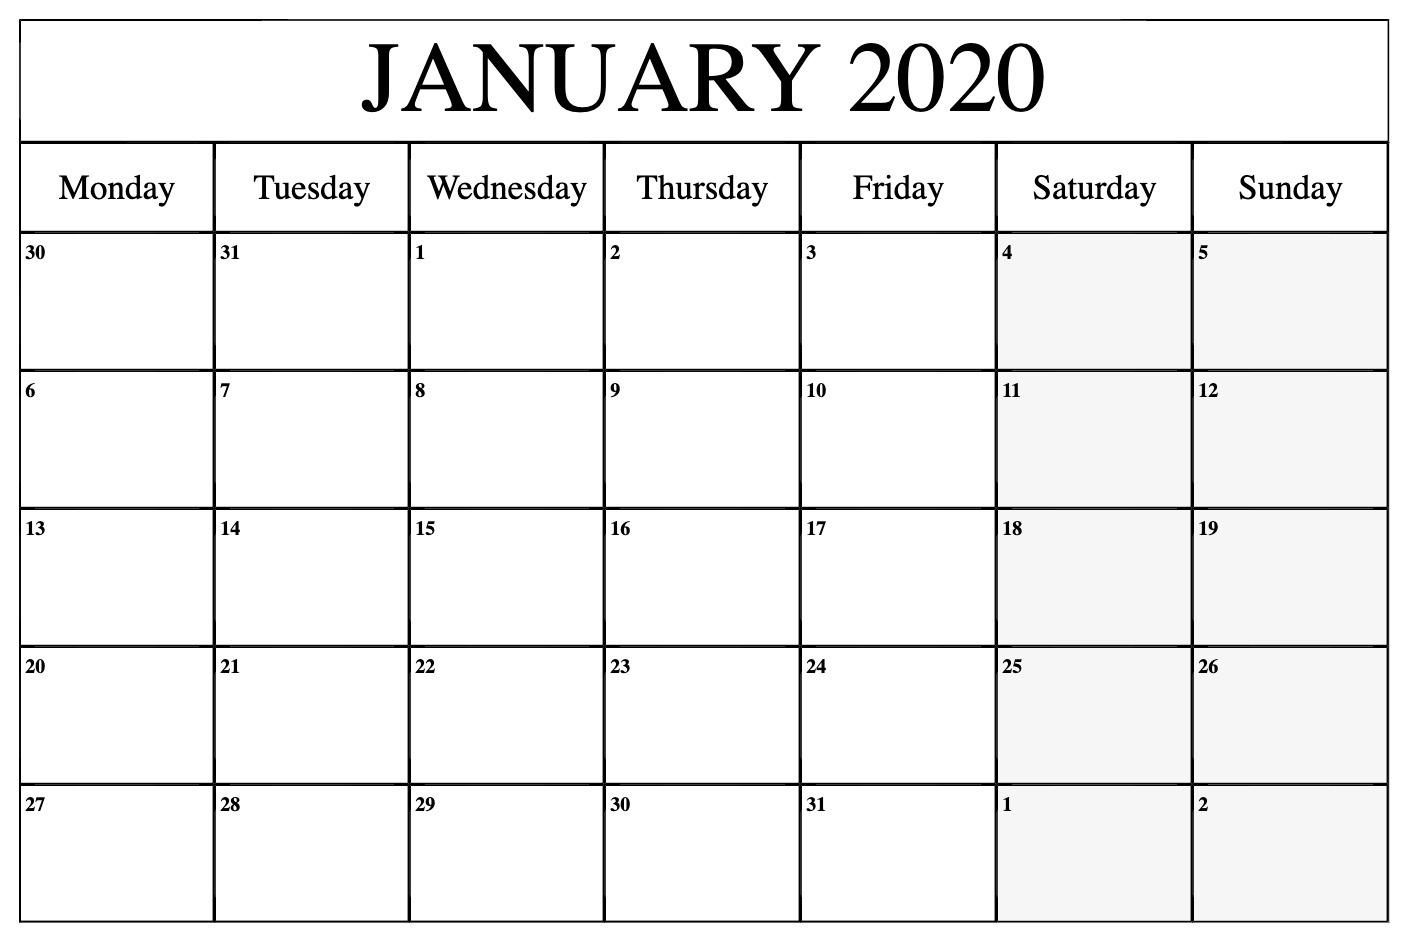 Monthly January 2020 Calendar Printable Pdf Word Excel regarding Jan 2020 Calendar